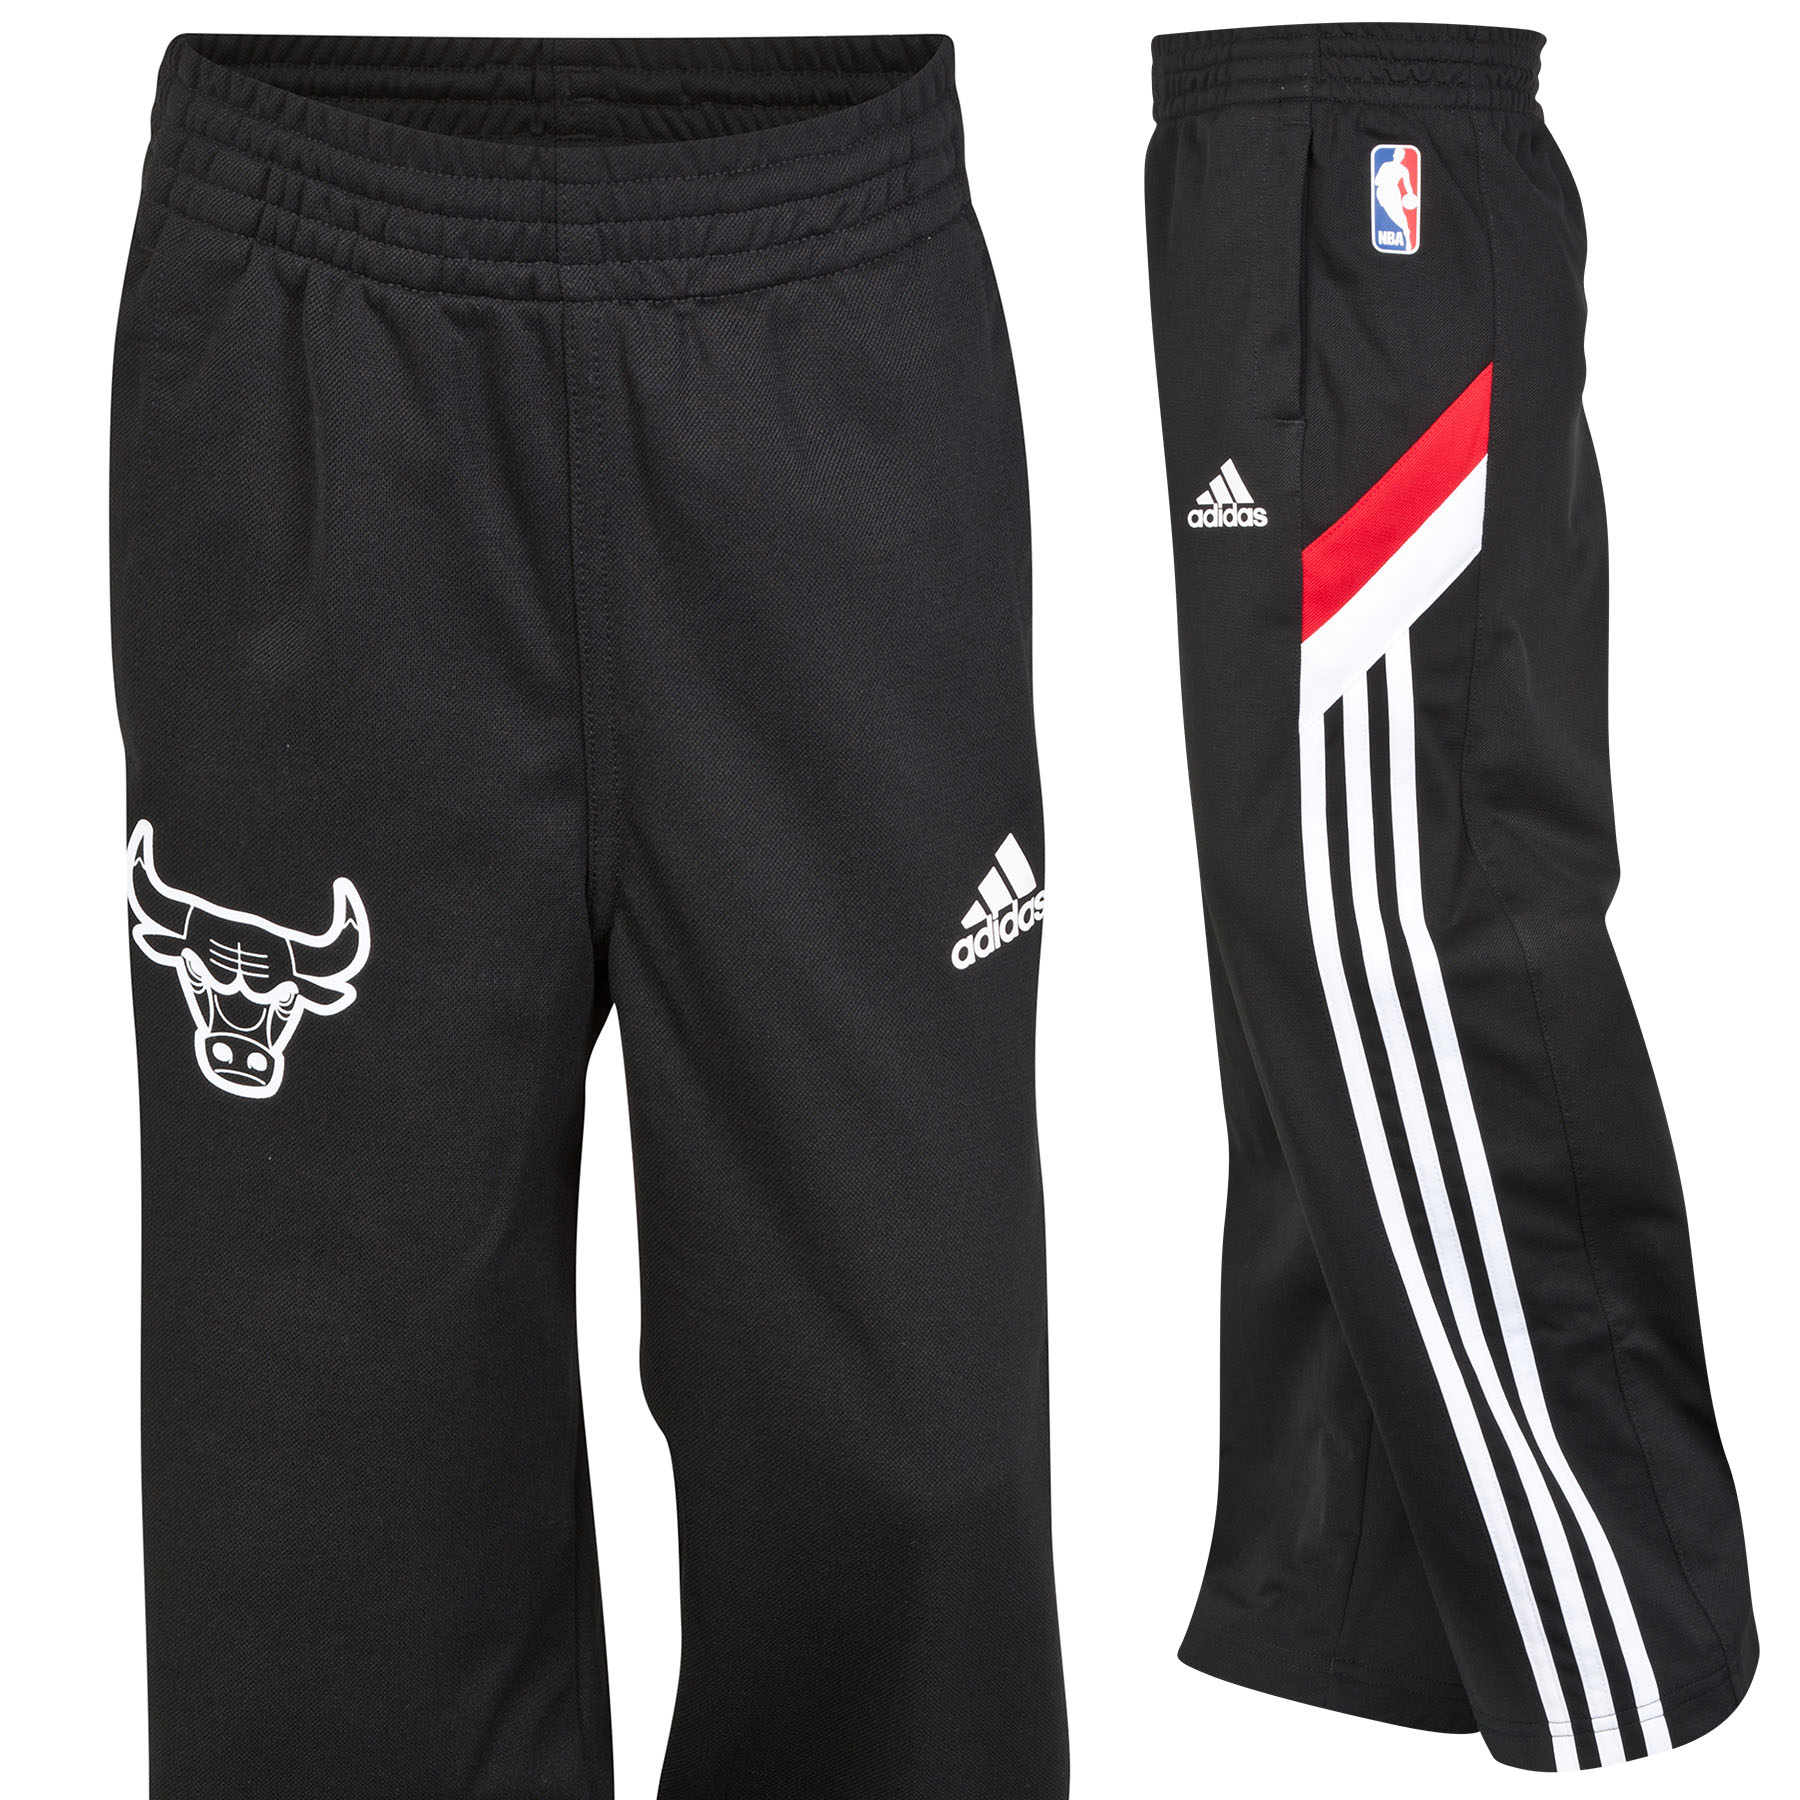 Chicago Bulls Winter Hoops Track Pant - Junior Black